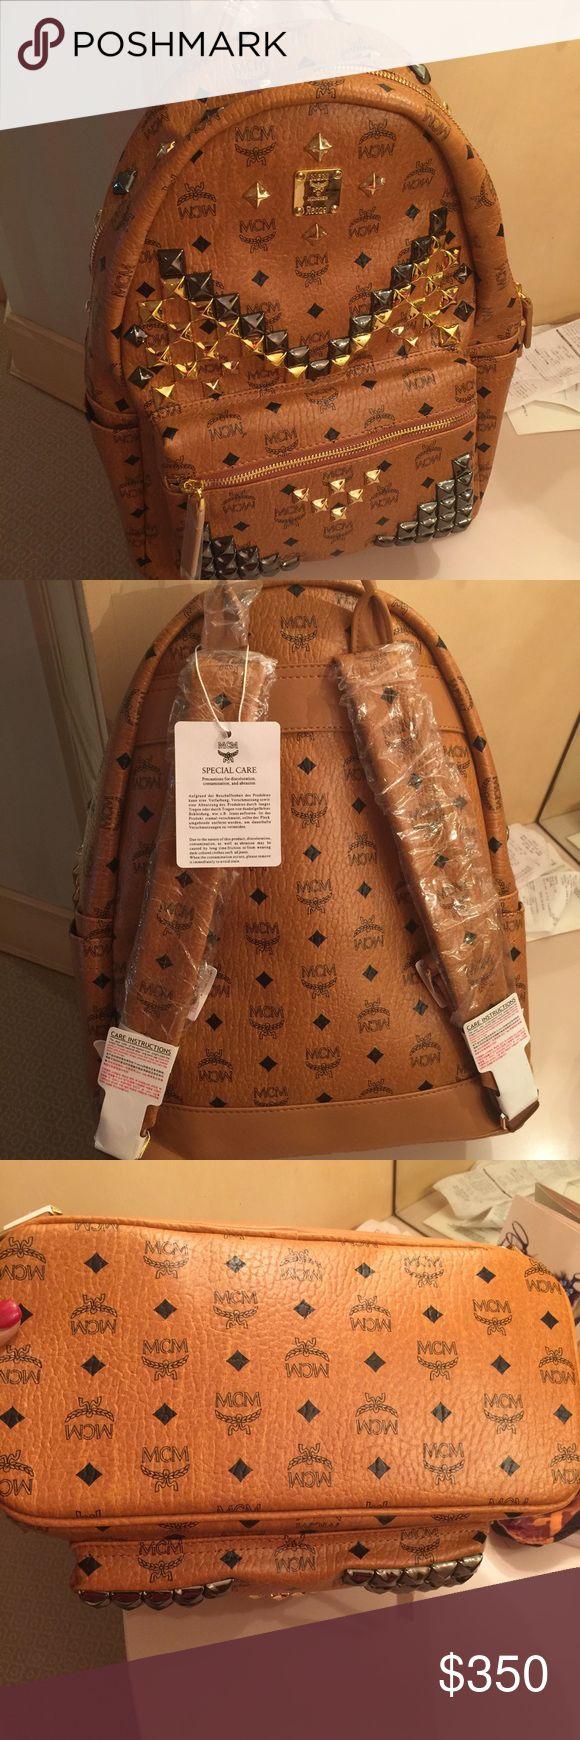 MCM Backpack MCM Backpack 🅿️🅿️ Bags Backpacks